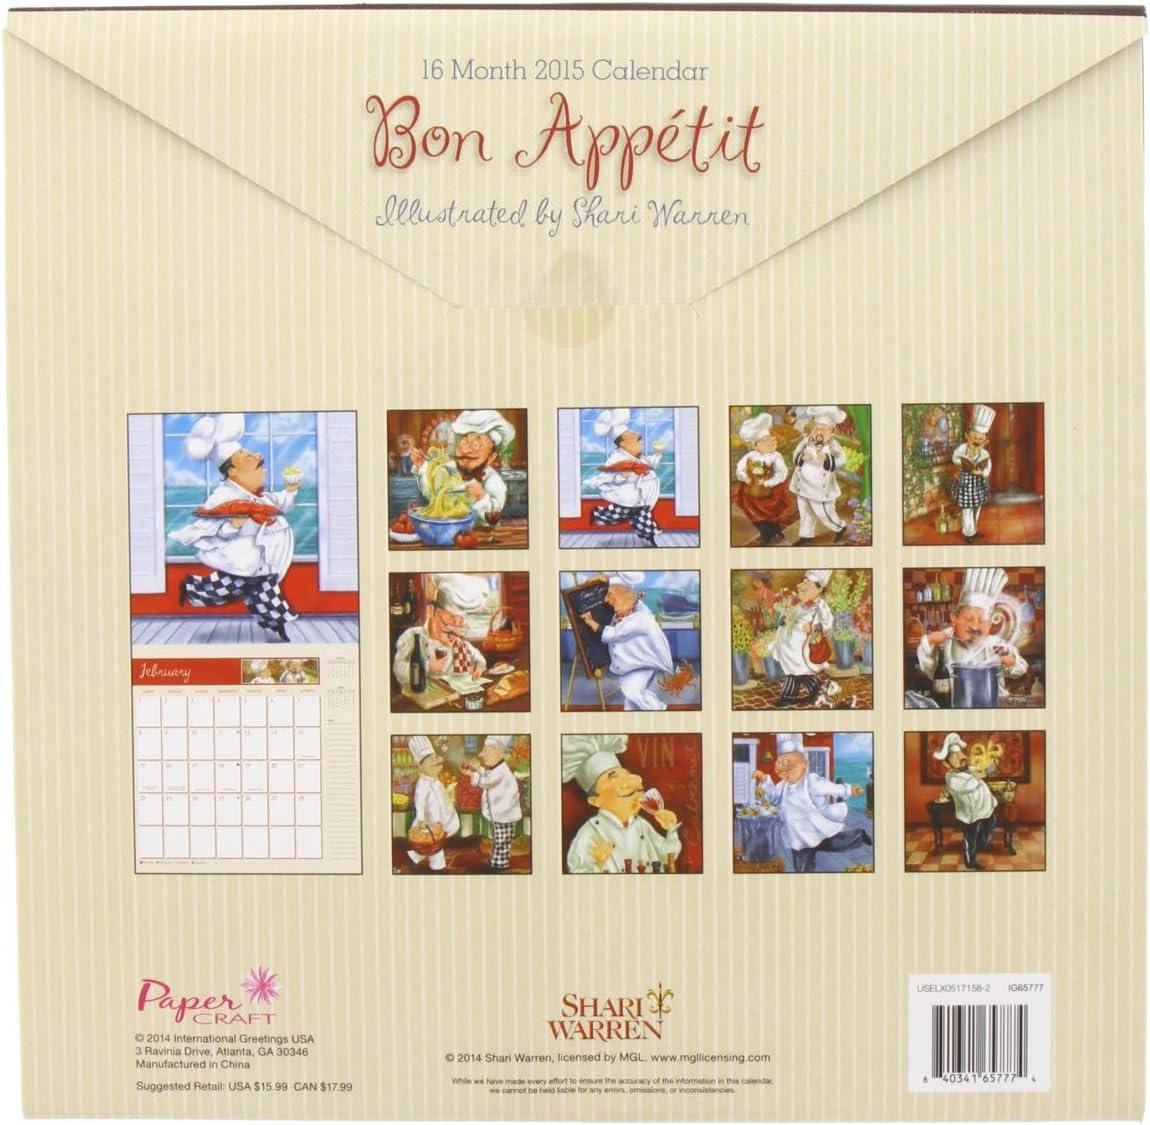 Ravinia 2022 Calendar.Amazon Com 1 X Bon Appetit Chef 2015 Calendar By Shari Warren 16 Month Wall Calendar Office Products